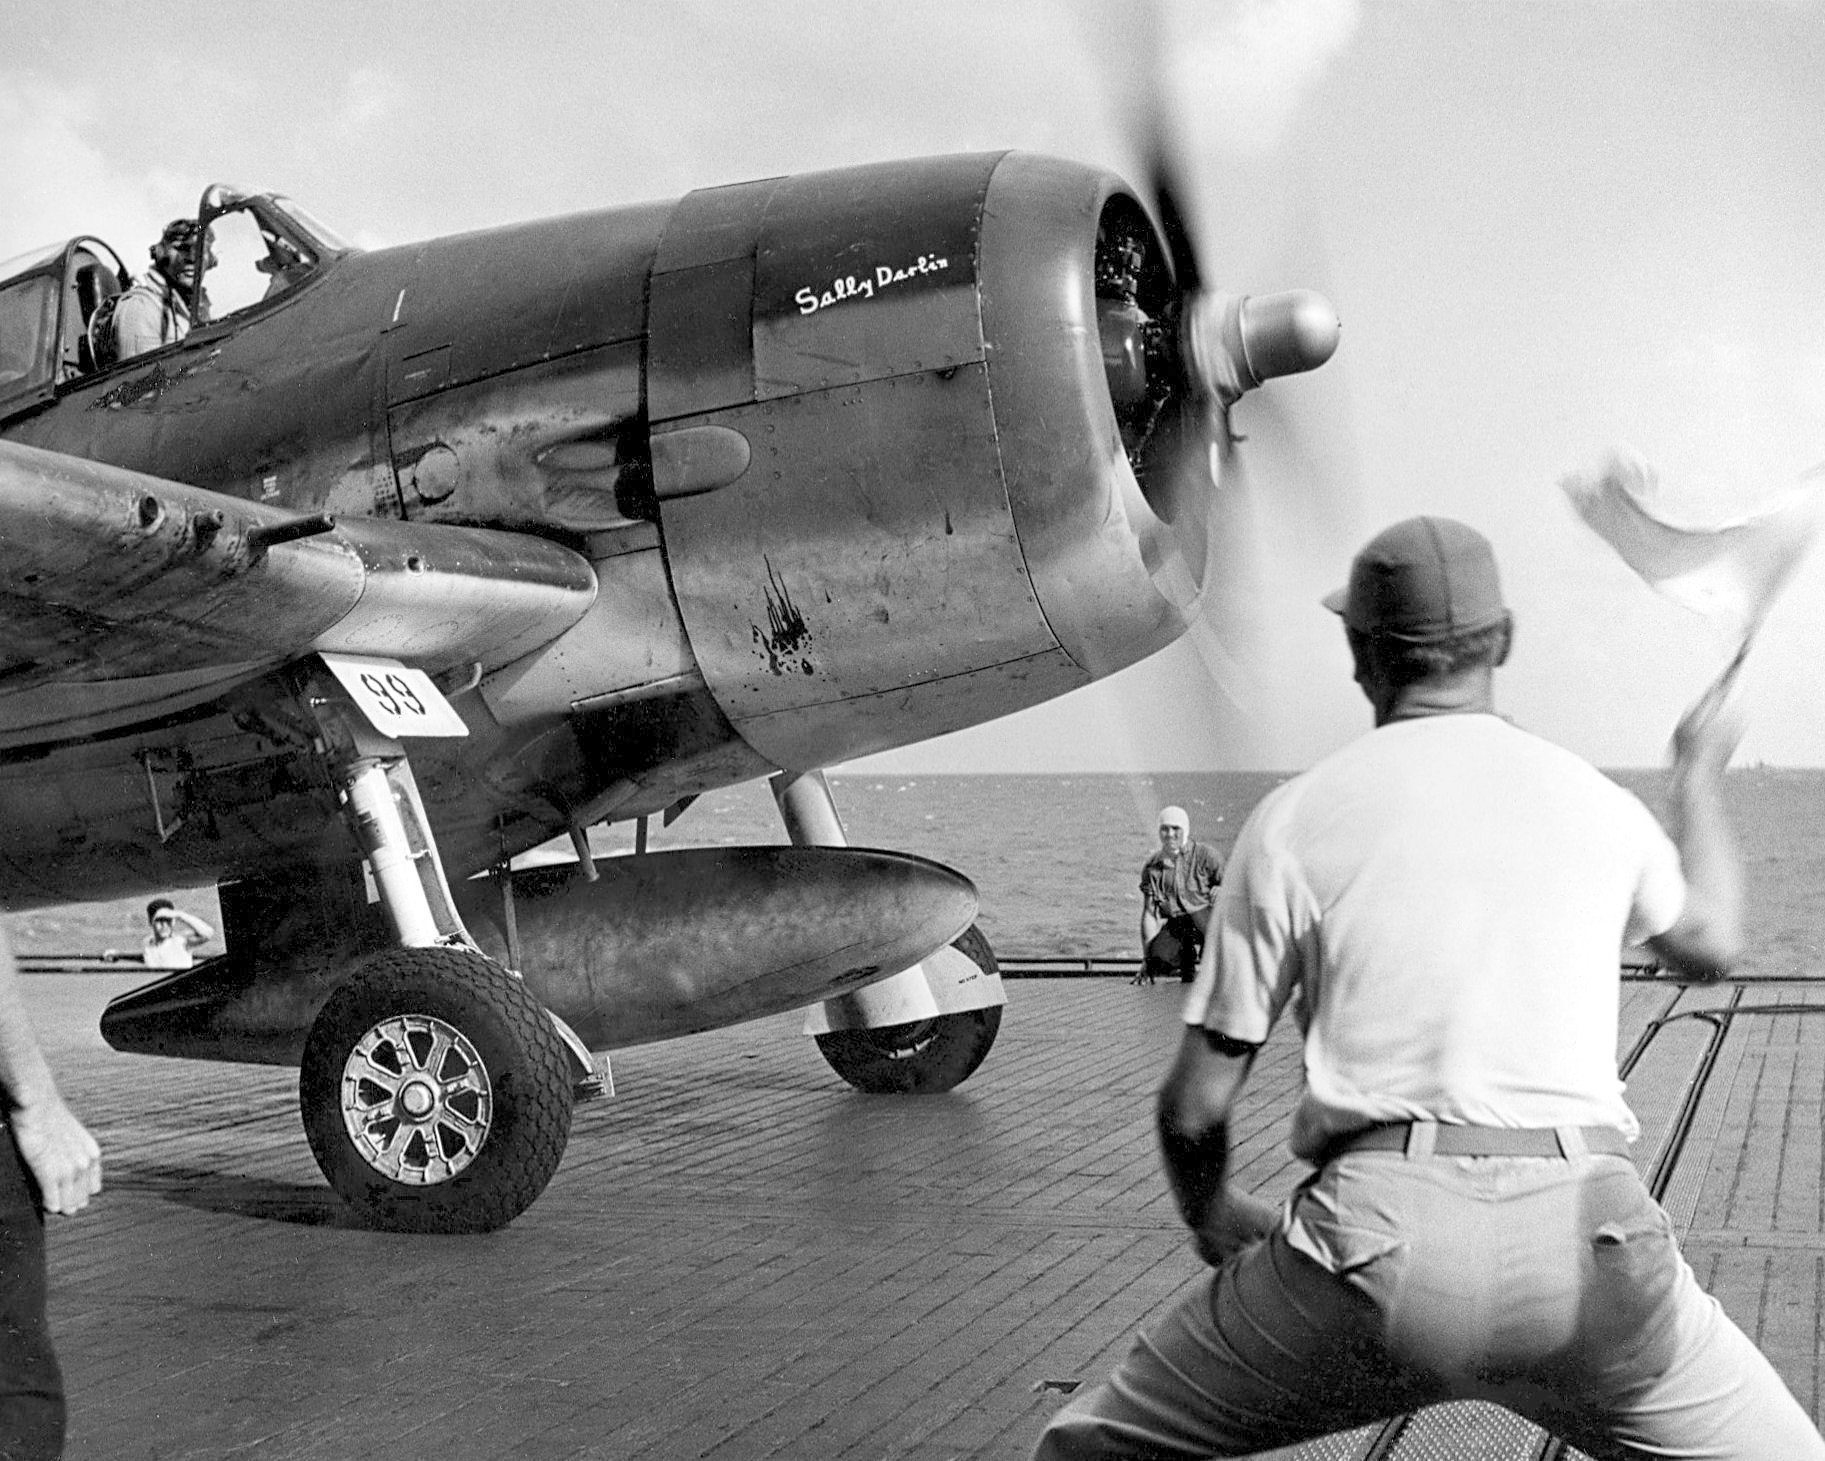 Grumman F6F 3 Hellcat VF 12 White 99 flown by CMDR Joseph C Clifton aboard the USS Saratoga 1944 01